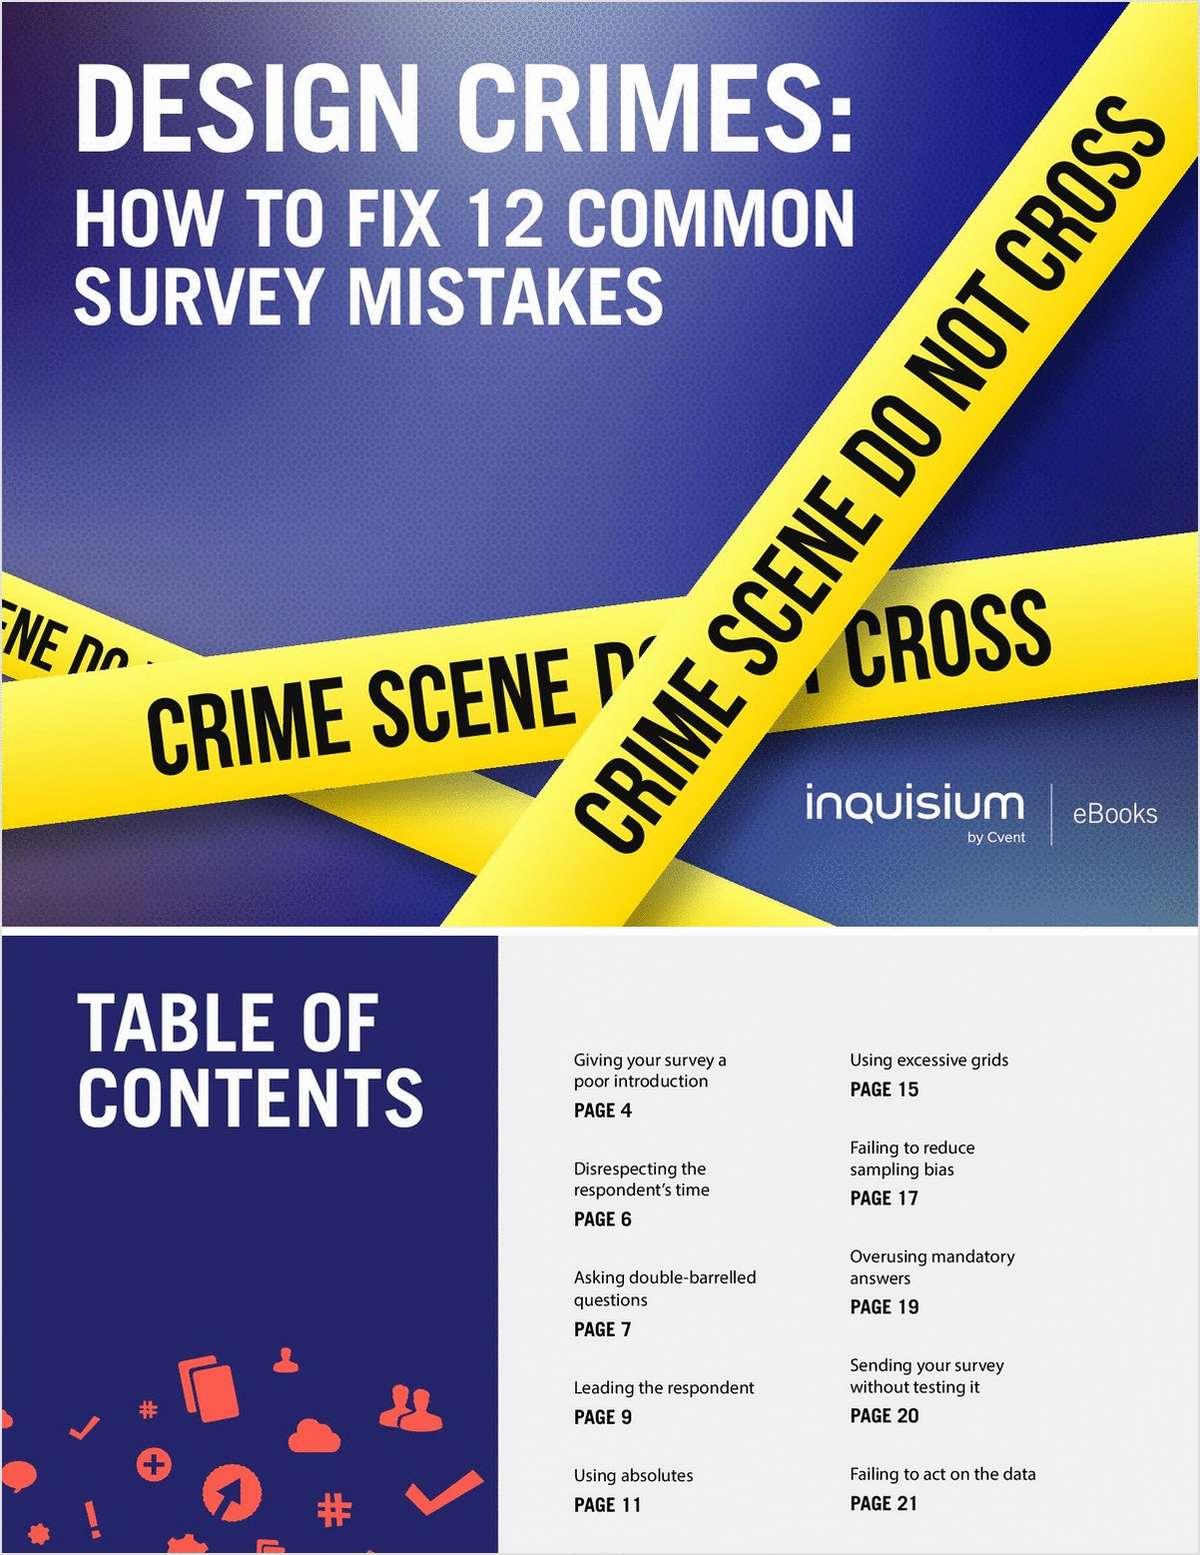 Design Crimes: How to Fix 12 Common Survey Mistakes